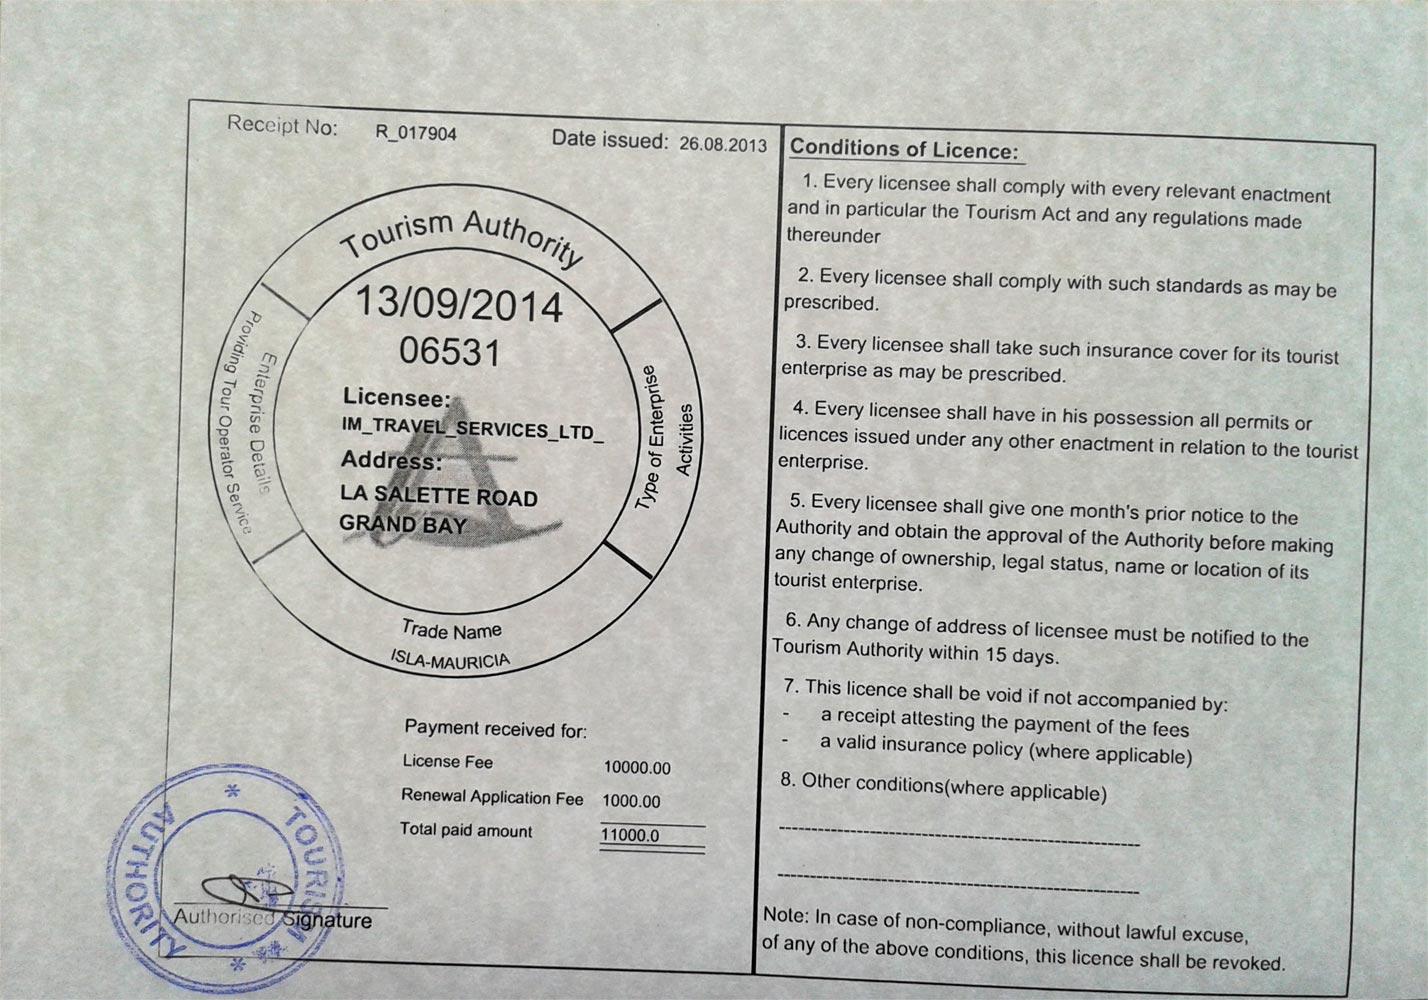 Tour Operators Licence of IM Travel Services Ltd.